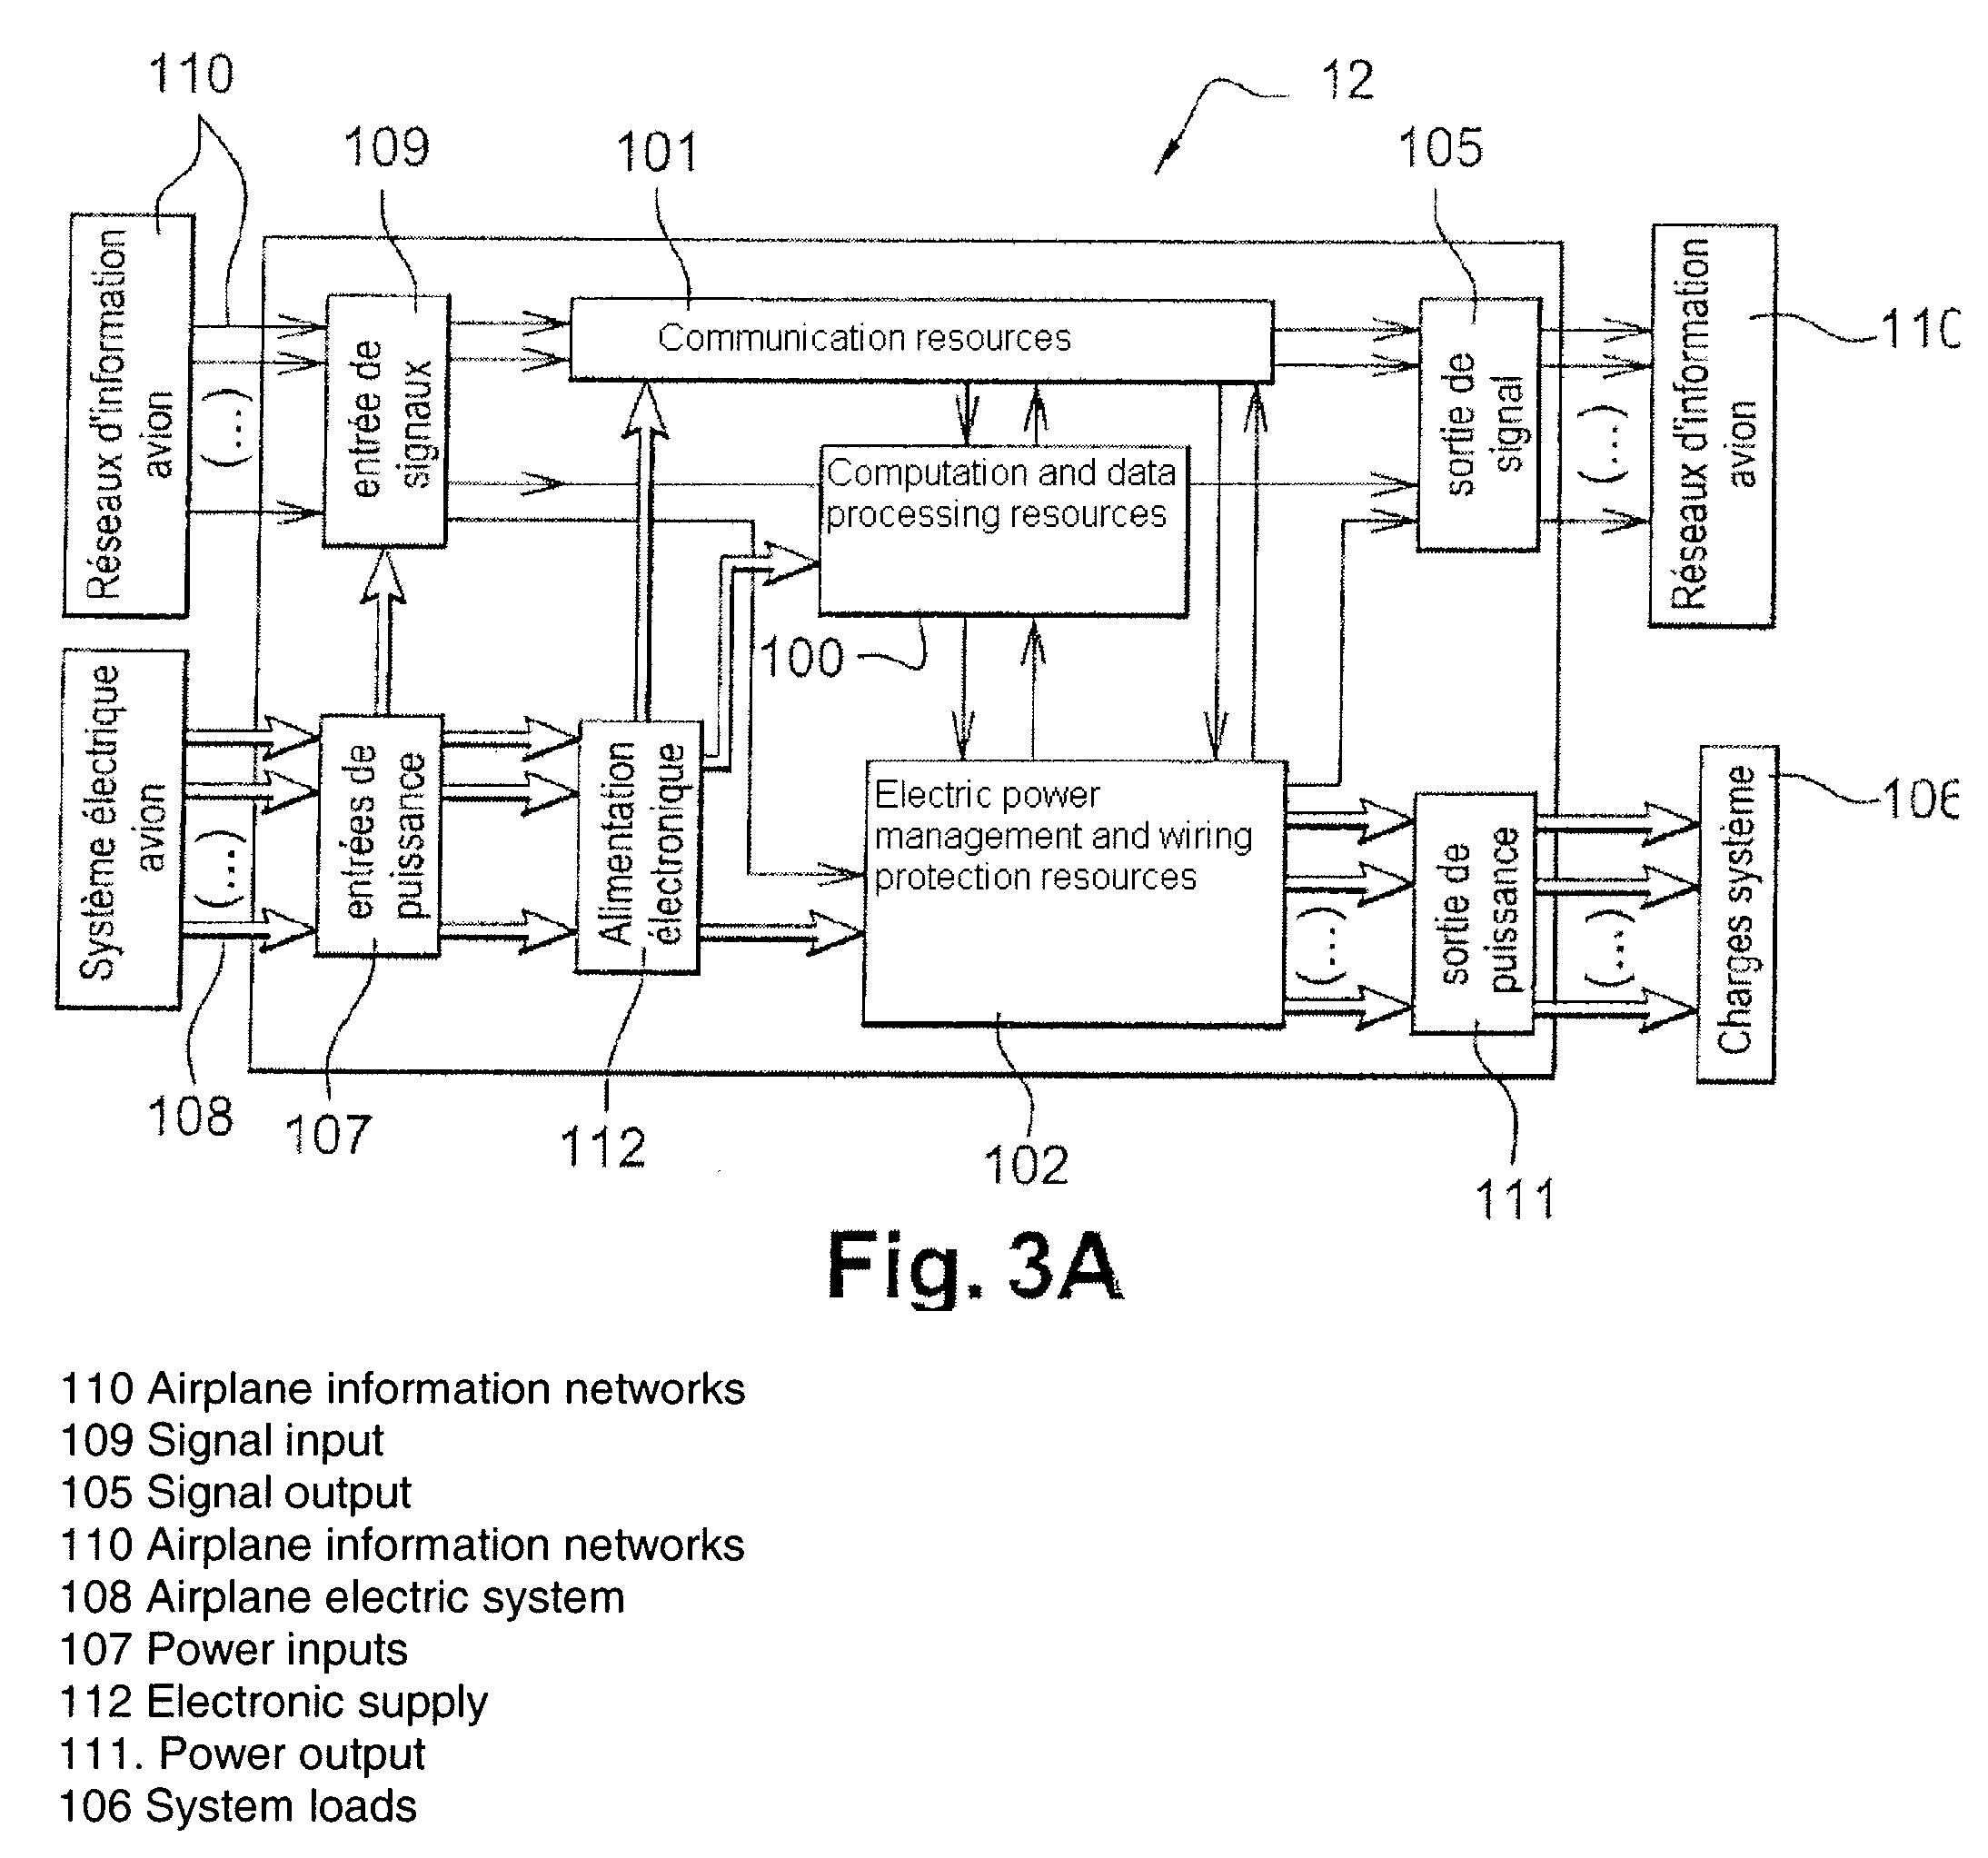 electronic power management